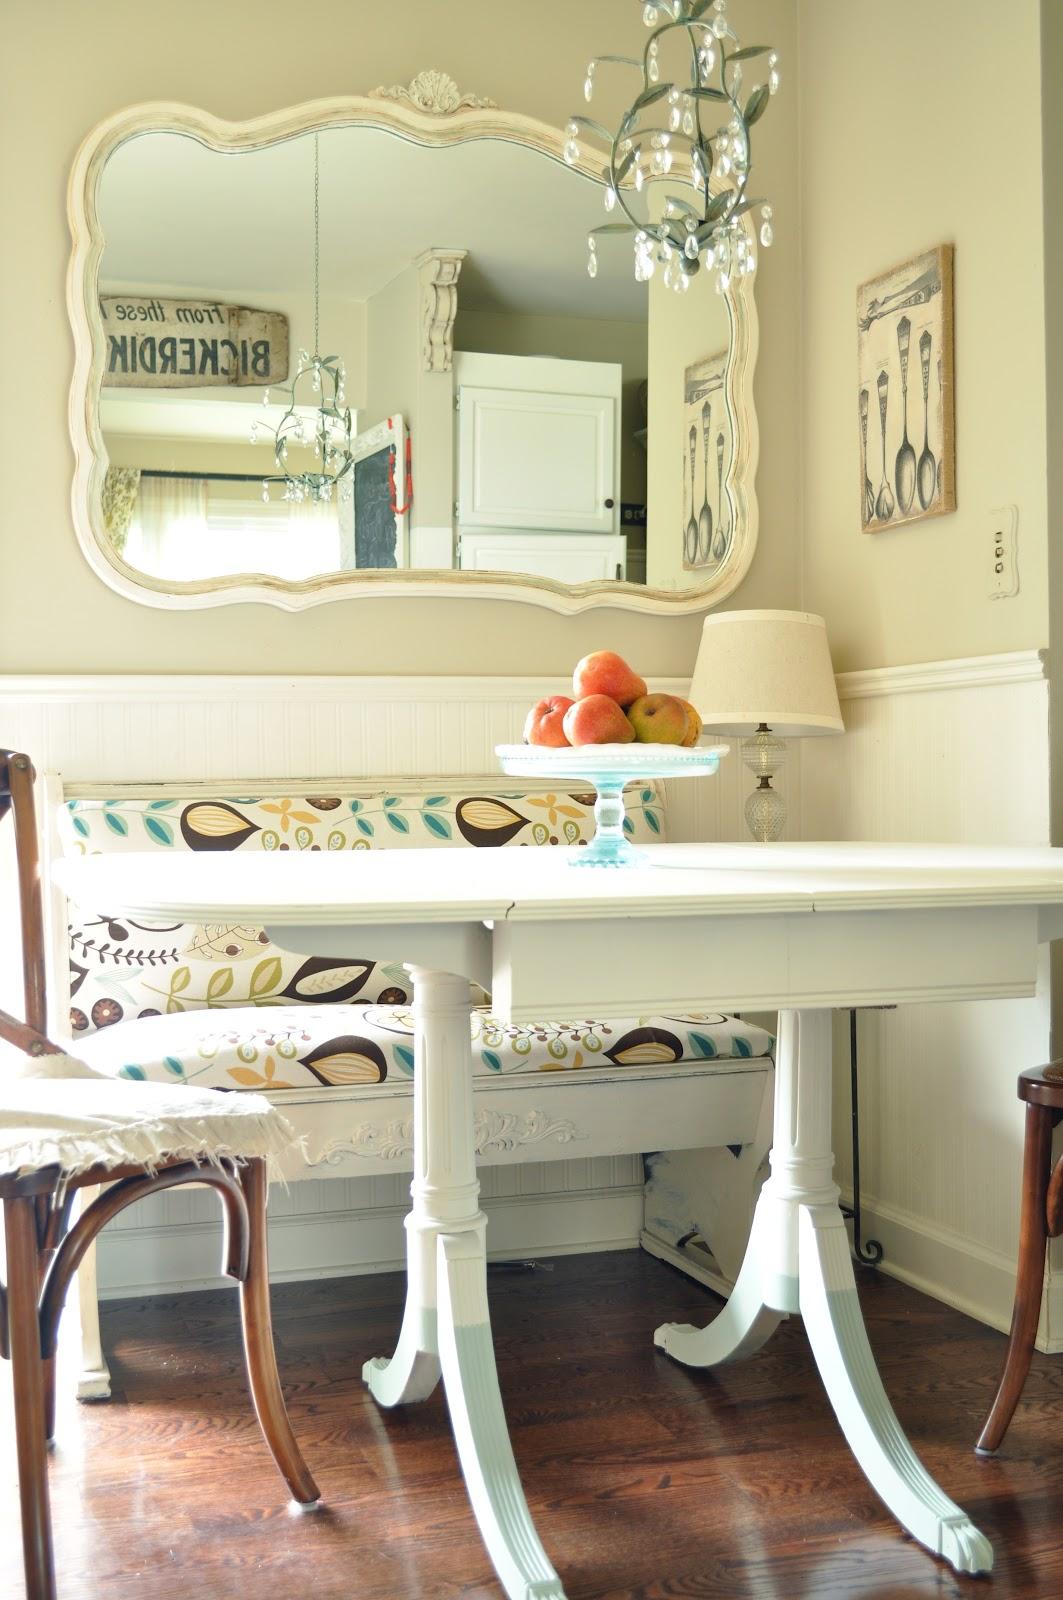 kitchen breakfast nook furniture u shaped cute kitchen breakfast nook with dipdyed table legs painted and dip dye legs jennifer rizzo